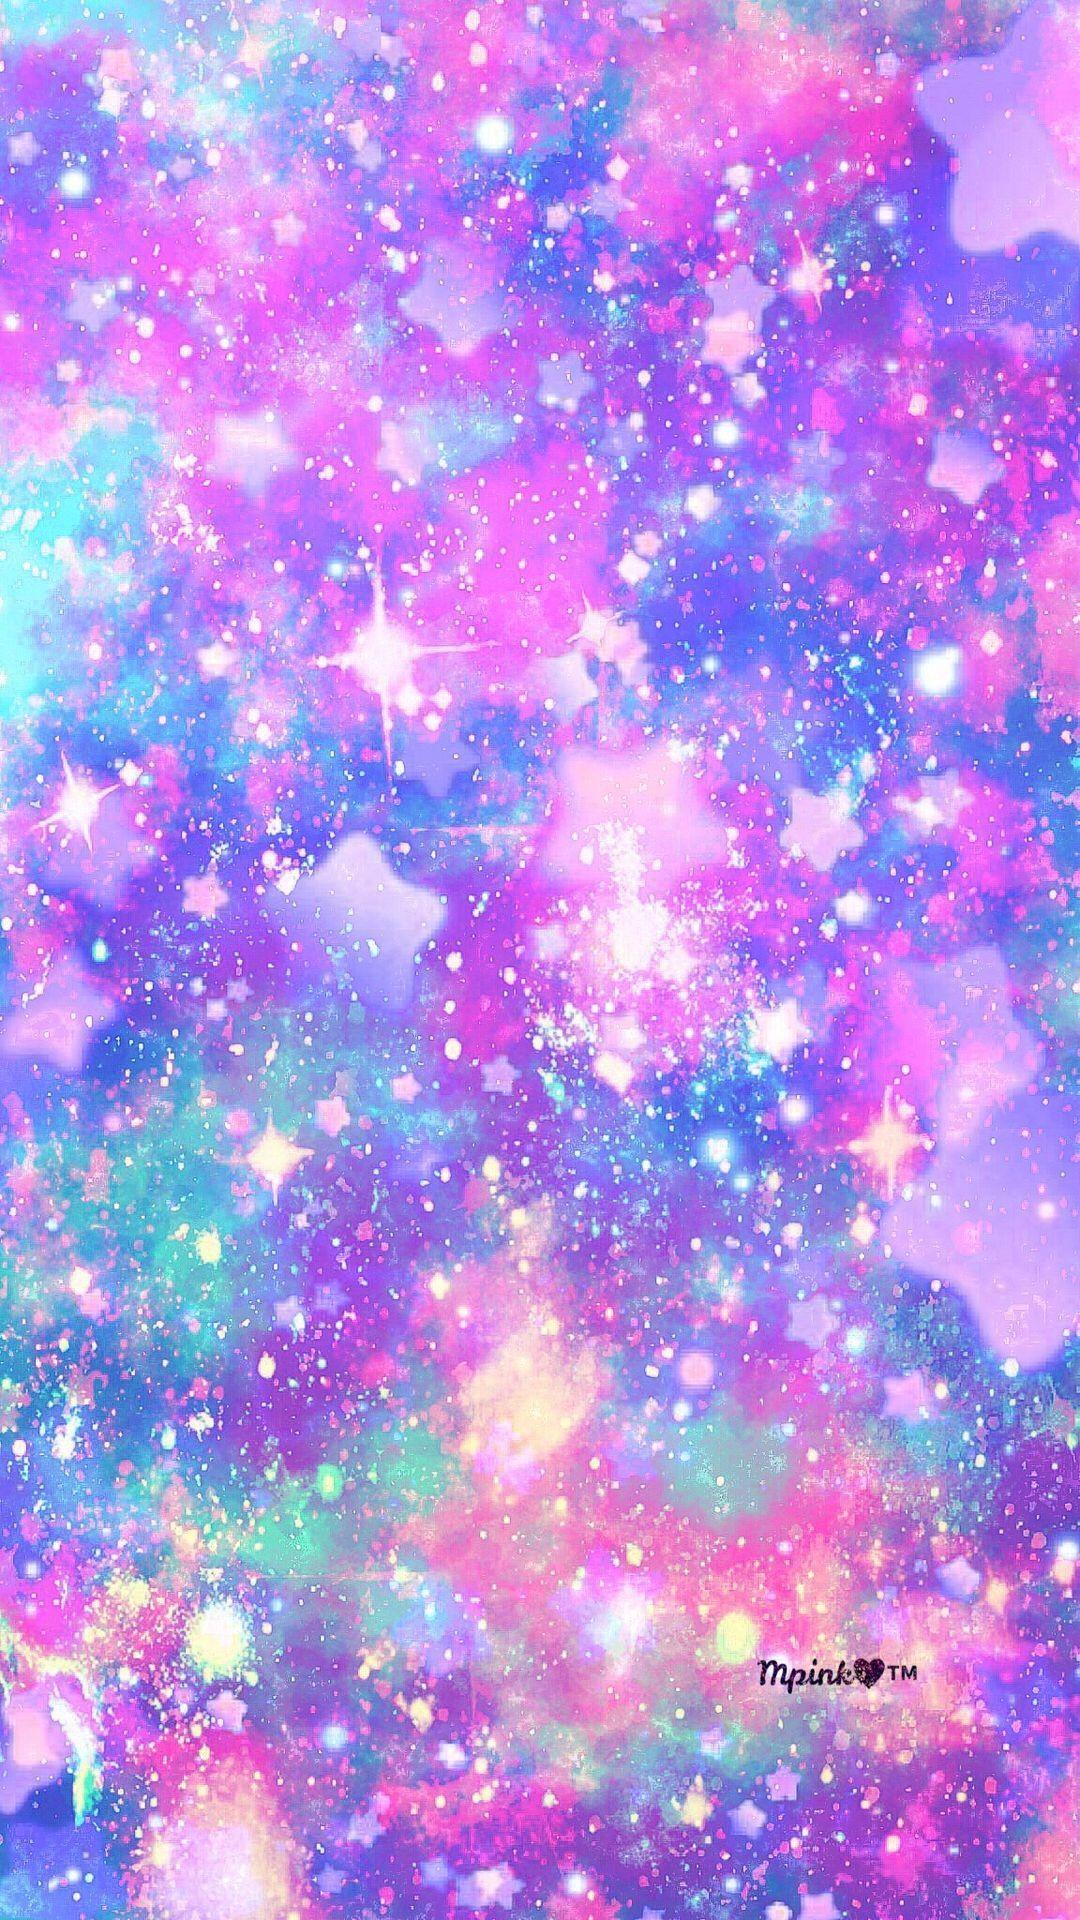 Pastel Bleu Et Violet Hd Wallpaper Android Galaxy Wallpaper Iphone Unicorn Wallpaper Unicorn Wallpaper Cute